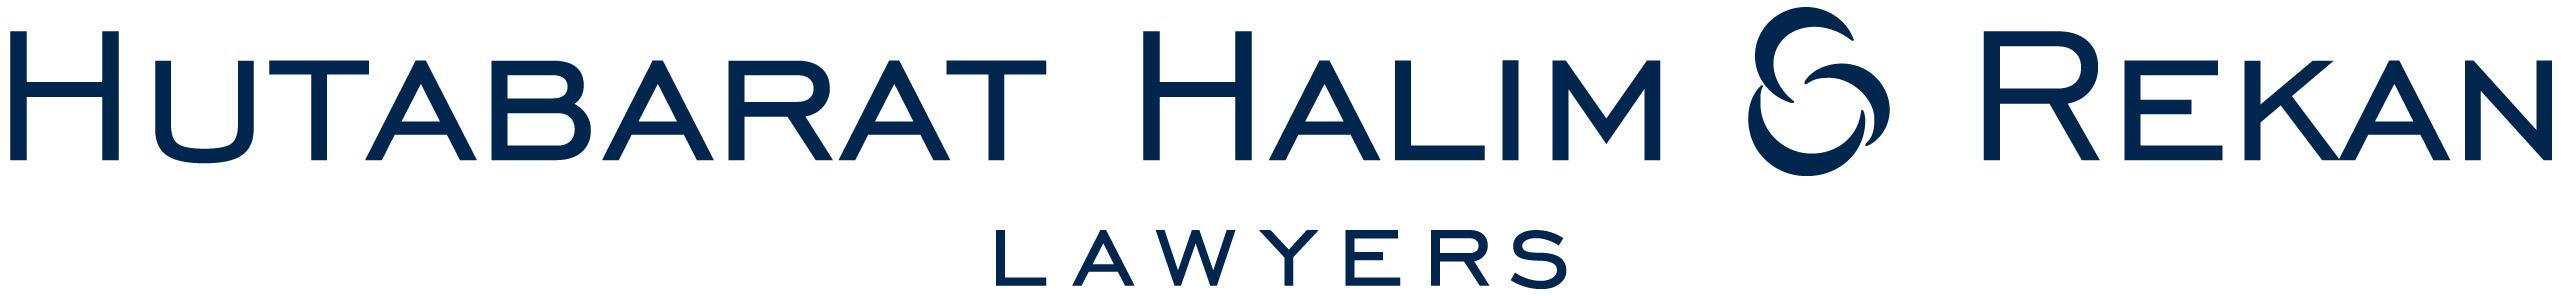 Hutabarat Halim & Rekan Lawyers logo